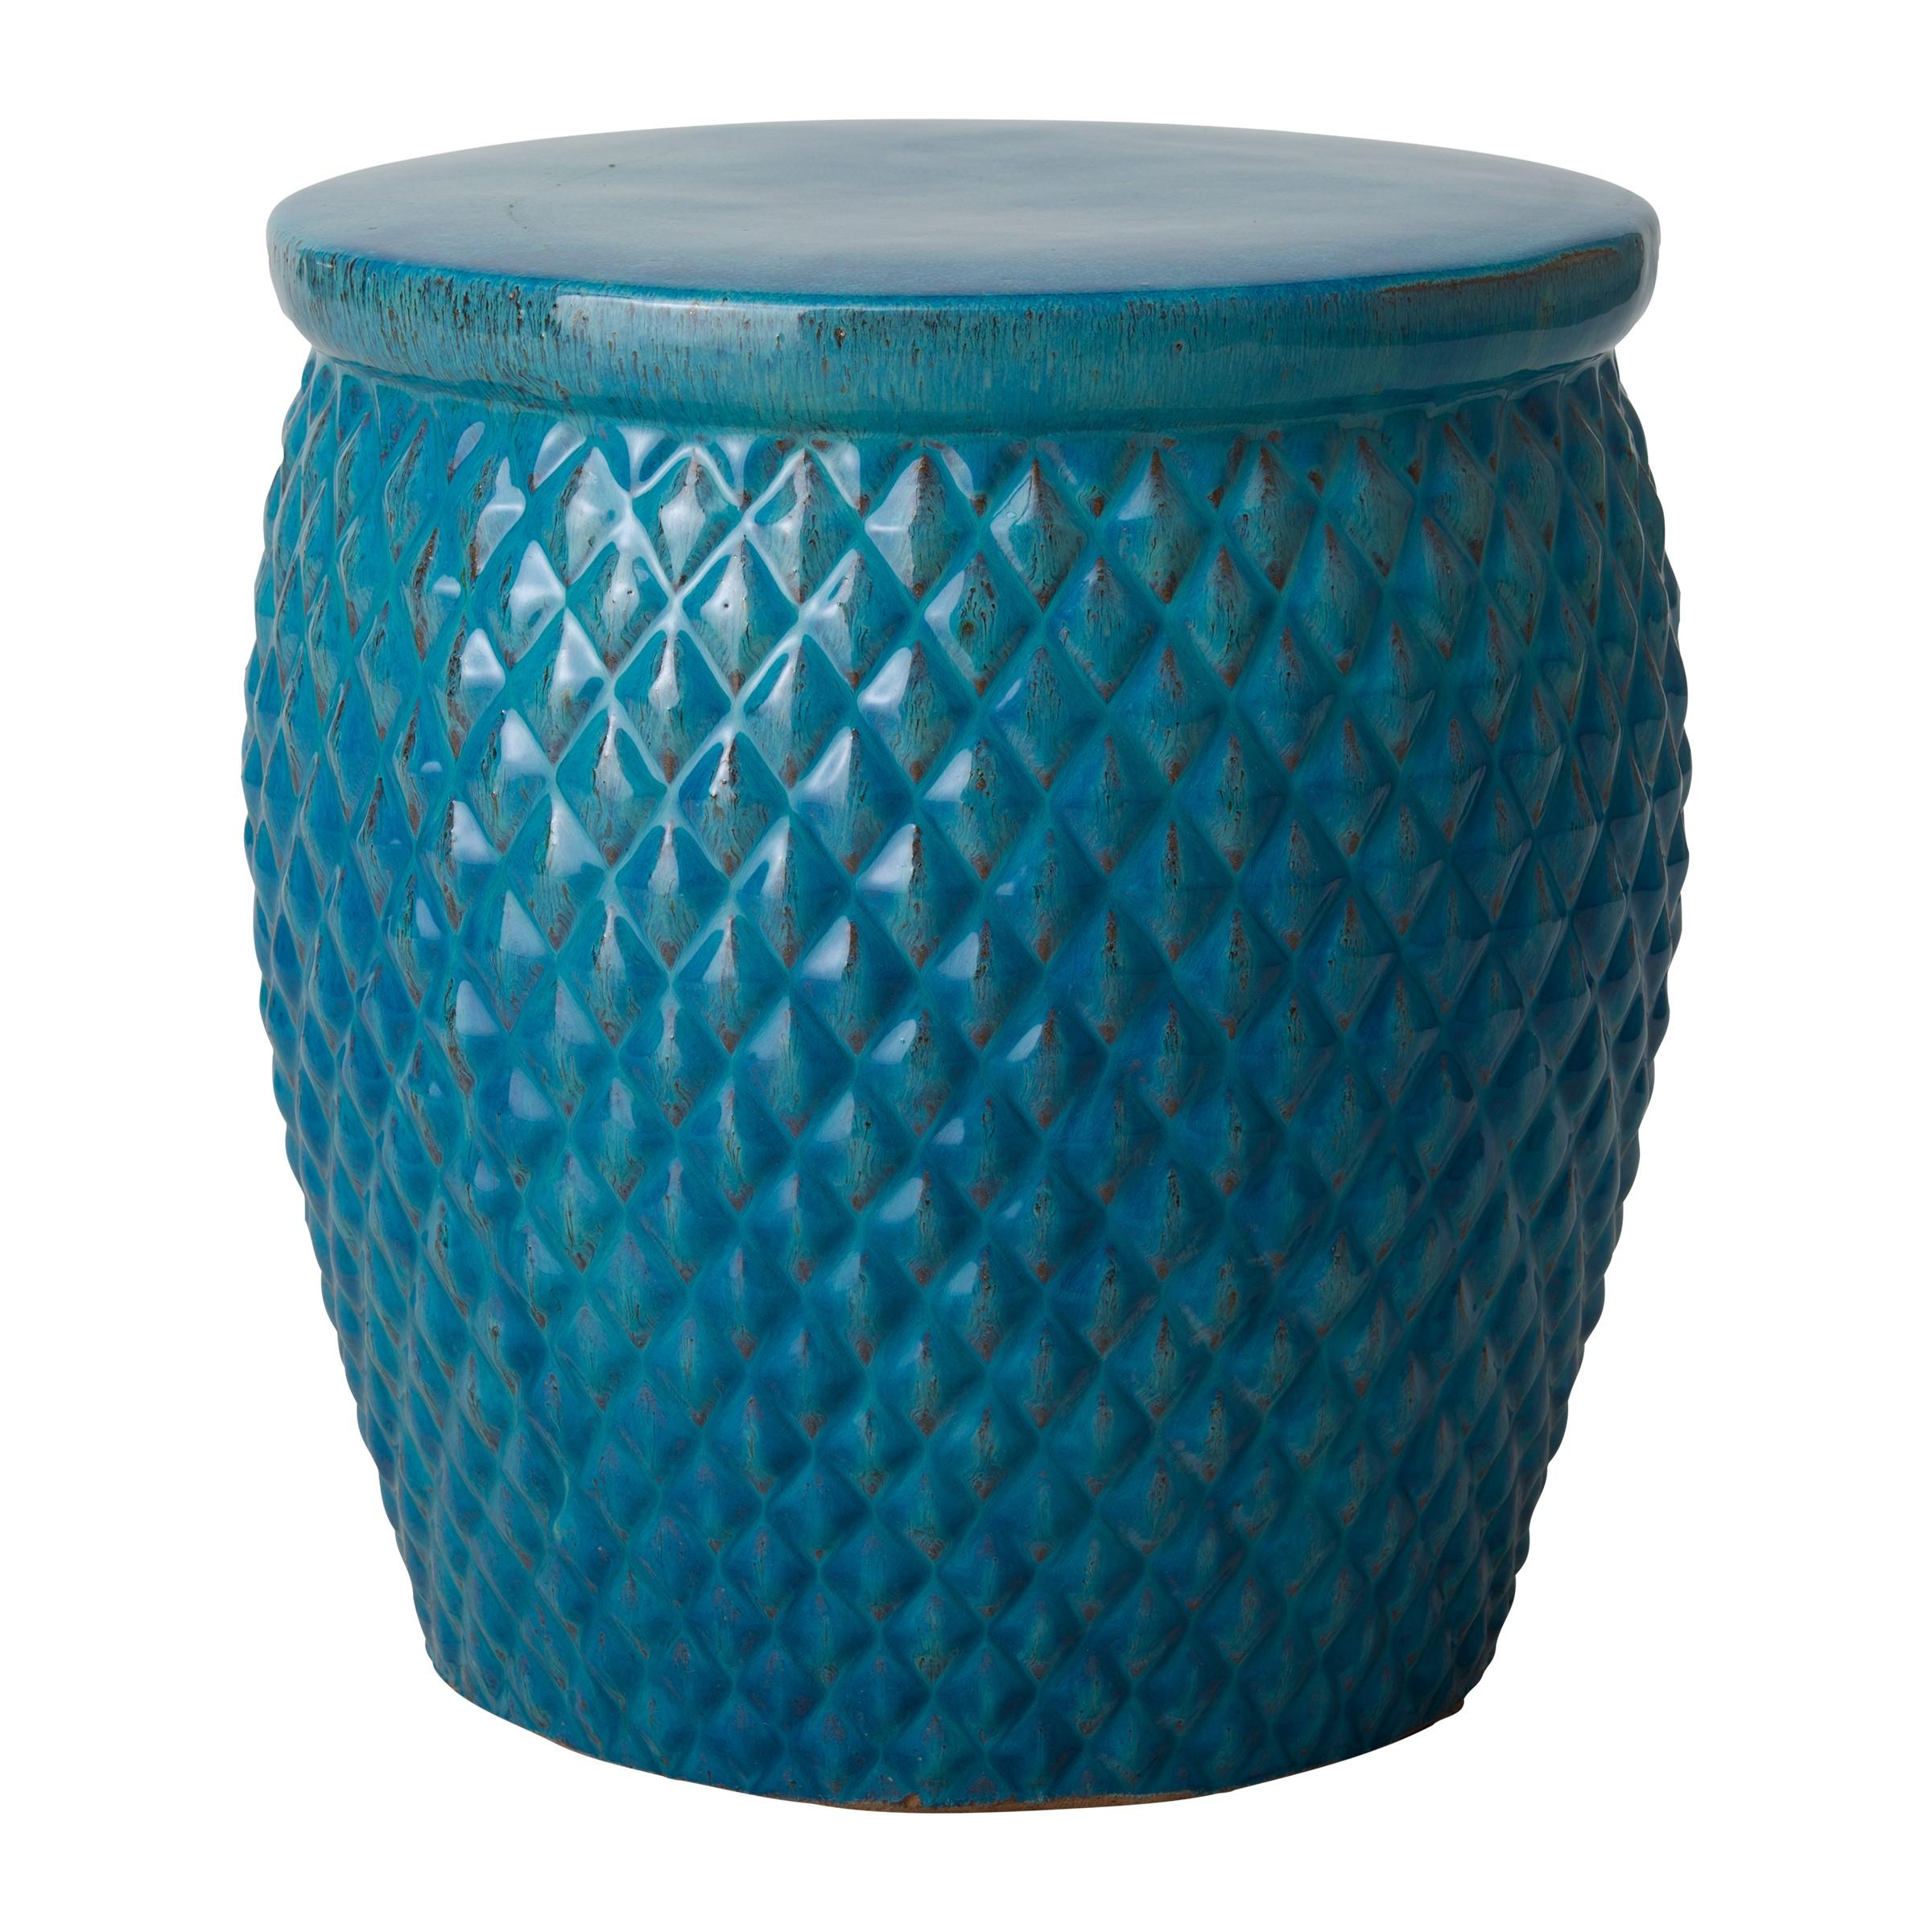 Garden stool pineapple garden stool with turquoise glaze DDEWLXF